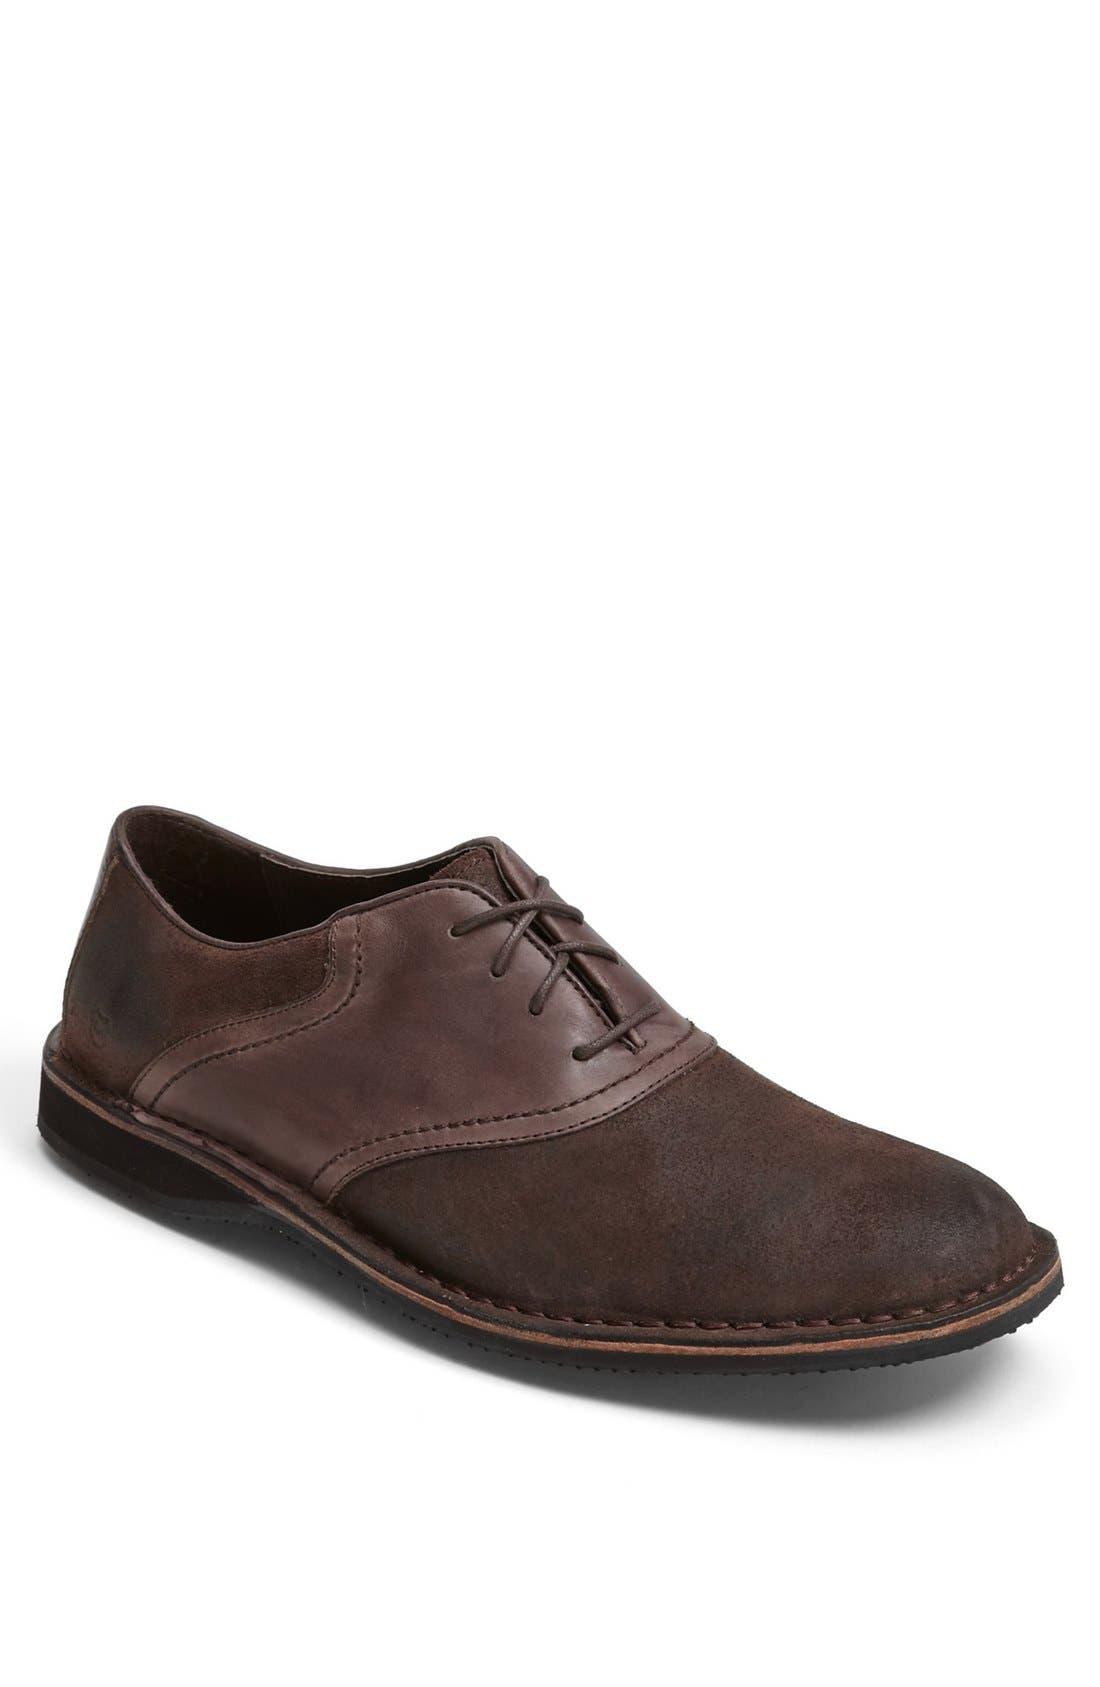 Main Image - Andrew Marc 'Dorchester' Saddle Shoe (Men)